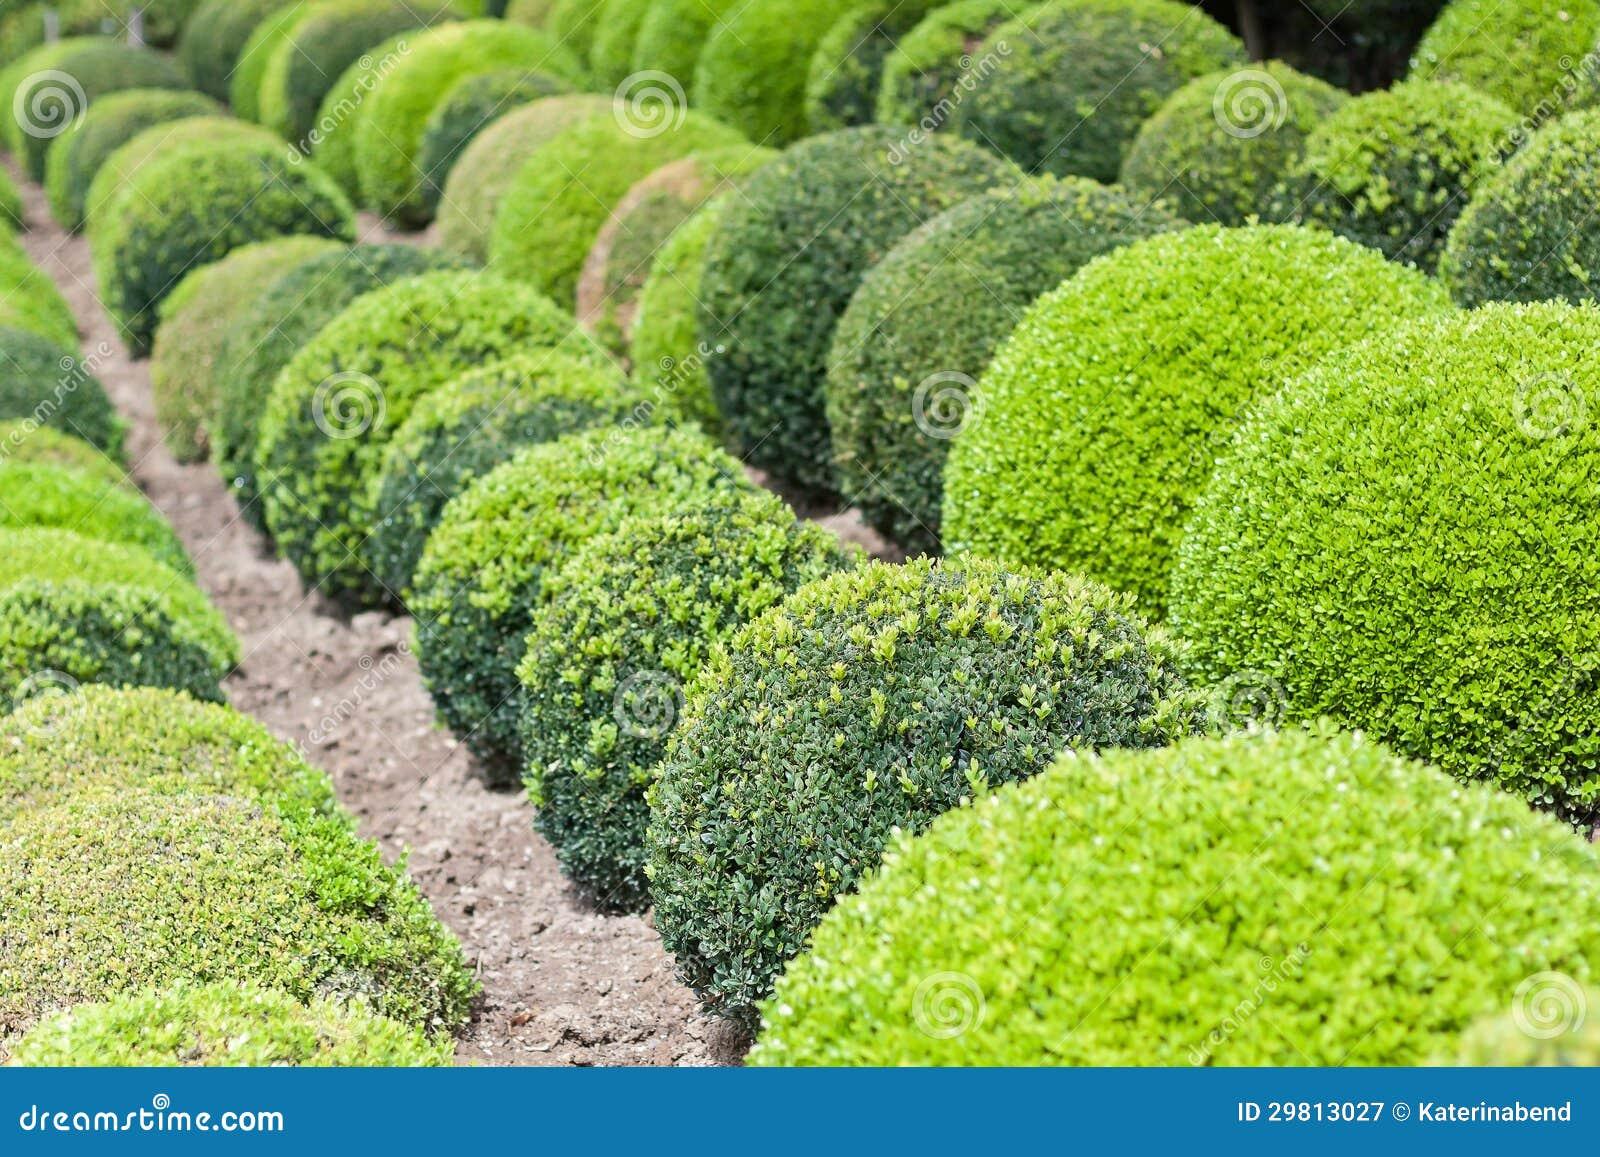 Boules vertes de jardin en france image stock image du for Jardin en france